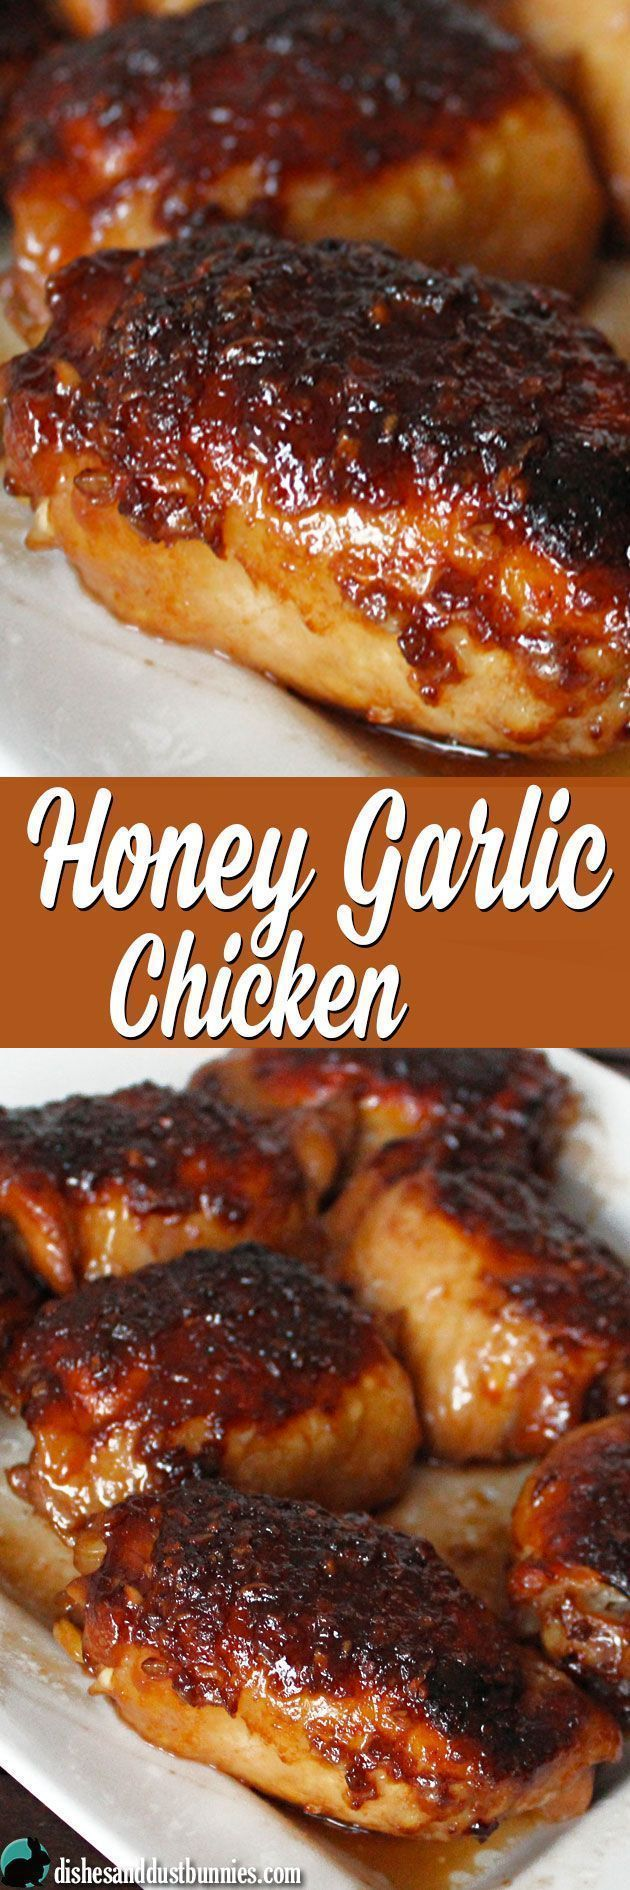 Honey Garlic Chicken (plus some really tasty sauce!) from http://dishesanddustbunnies.com